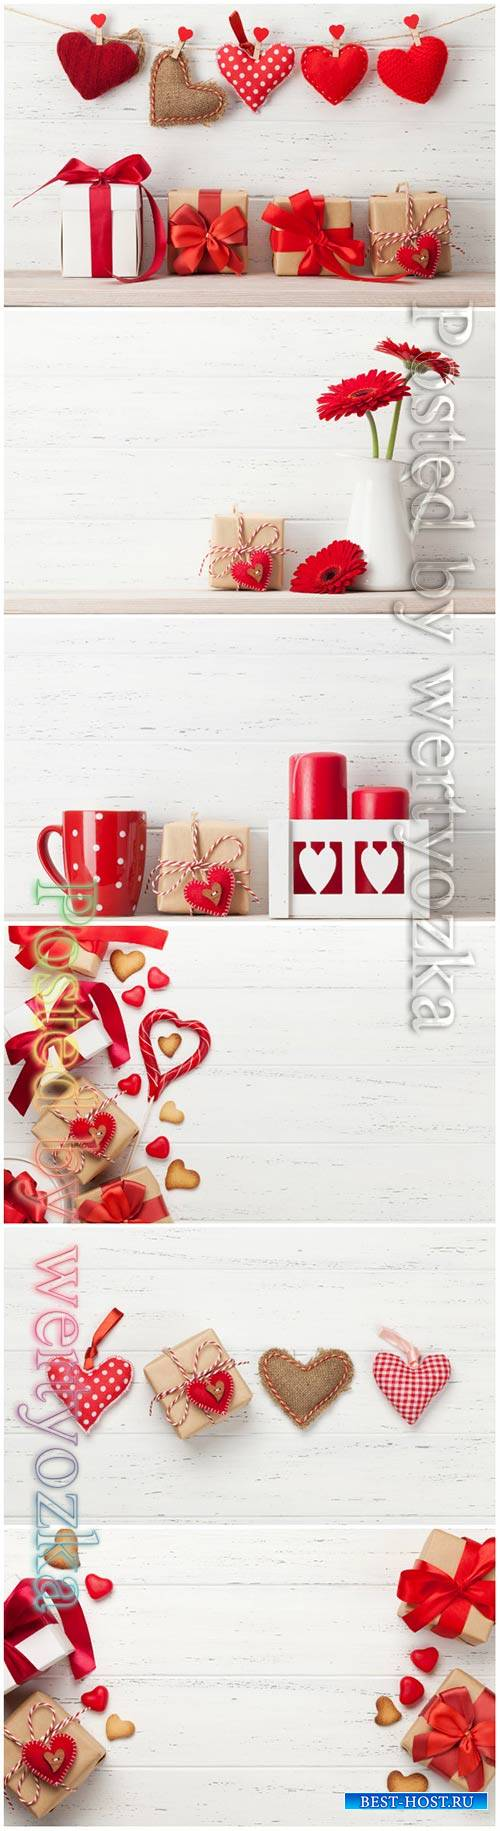 Valentines day beautiful stock photo # 2